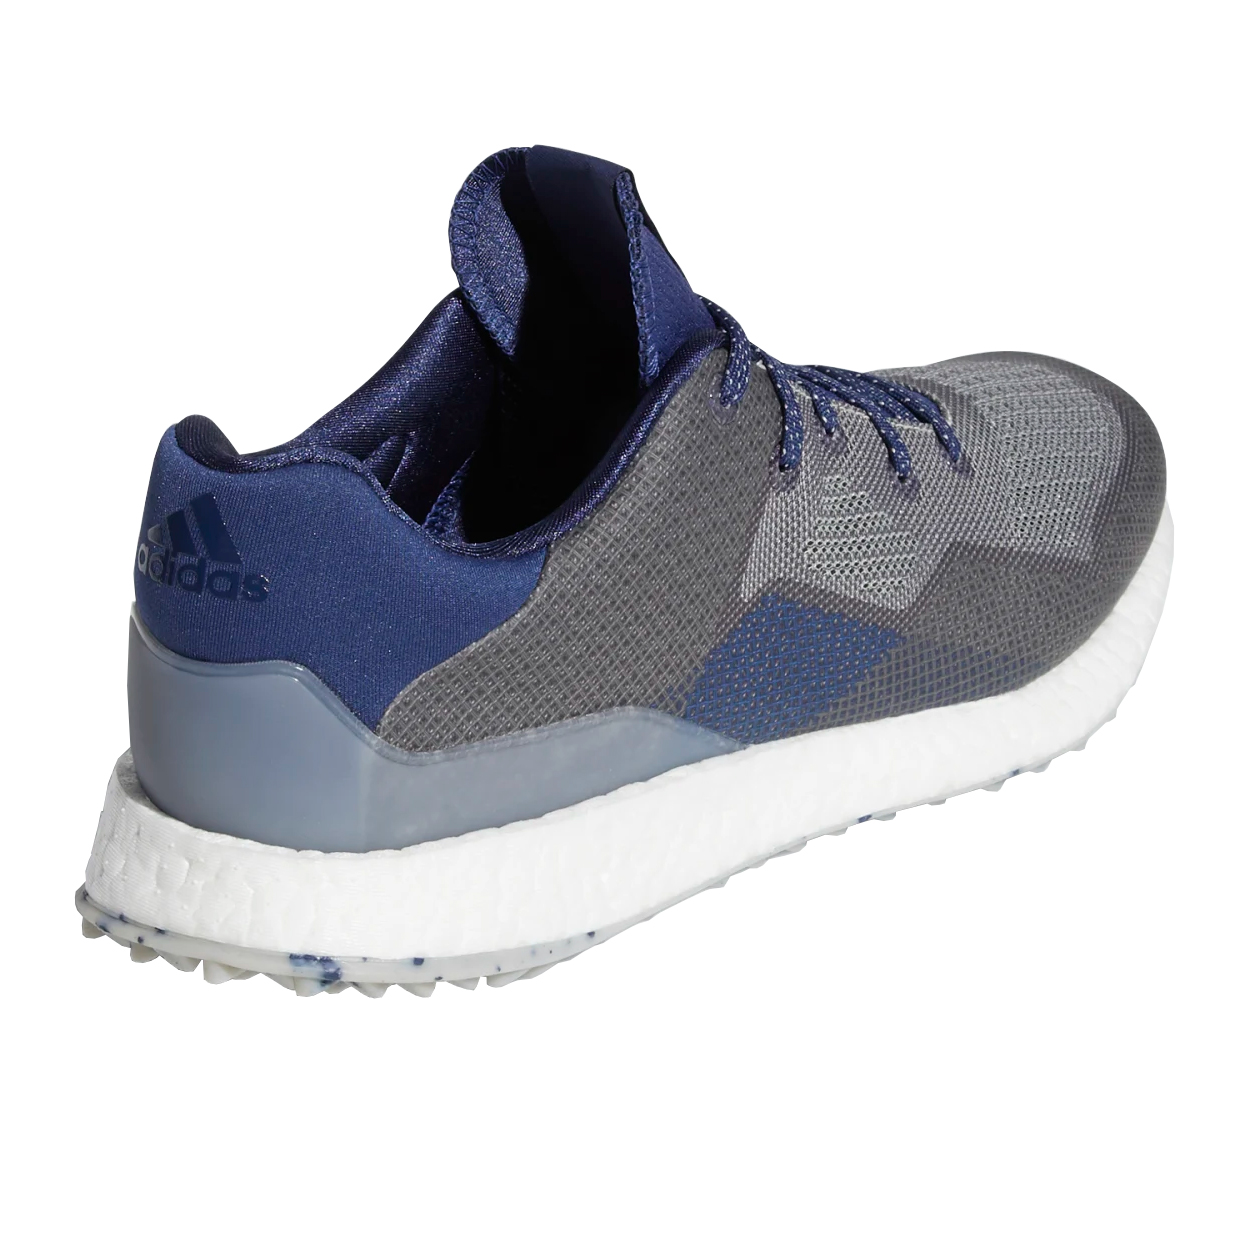 thumbnail 12 - Adidas Men's Crossknit DPR Spikeless Golf Shoes,  Brand New